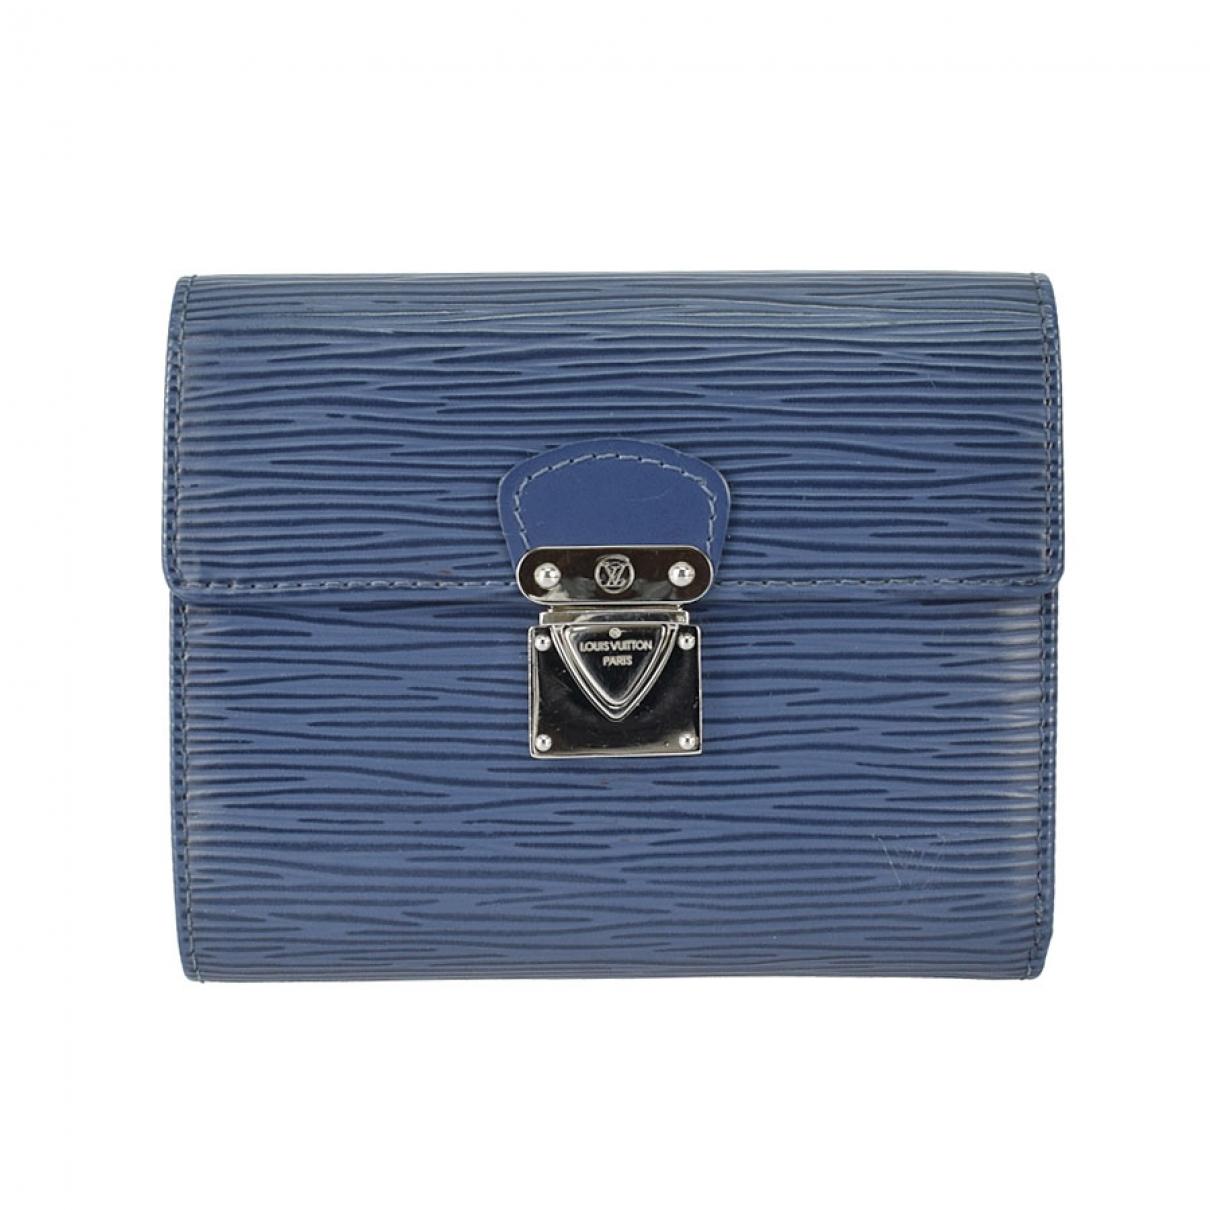 Louis Vuitton - Portefeuille Koala pour femme en cuir - bleu